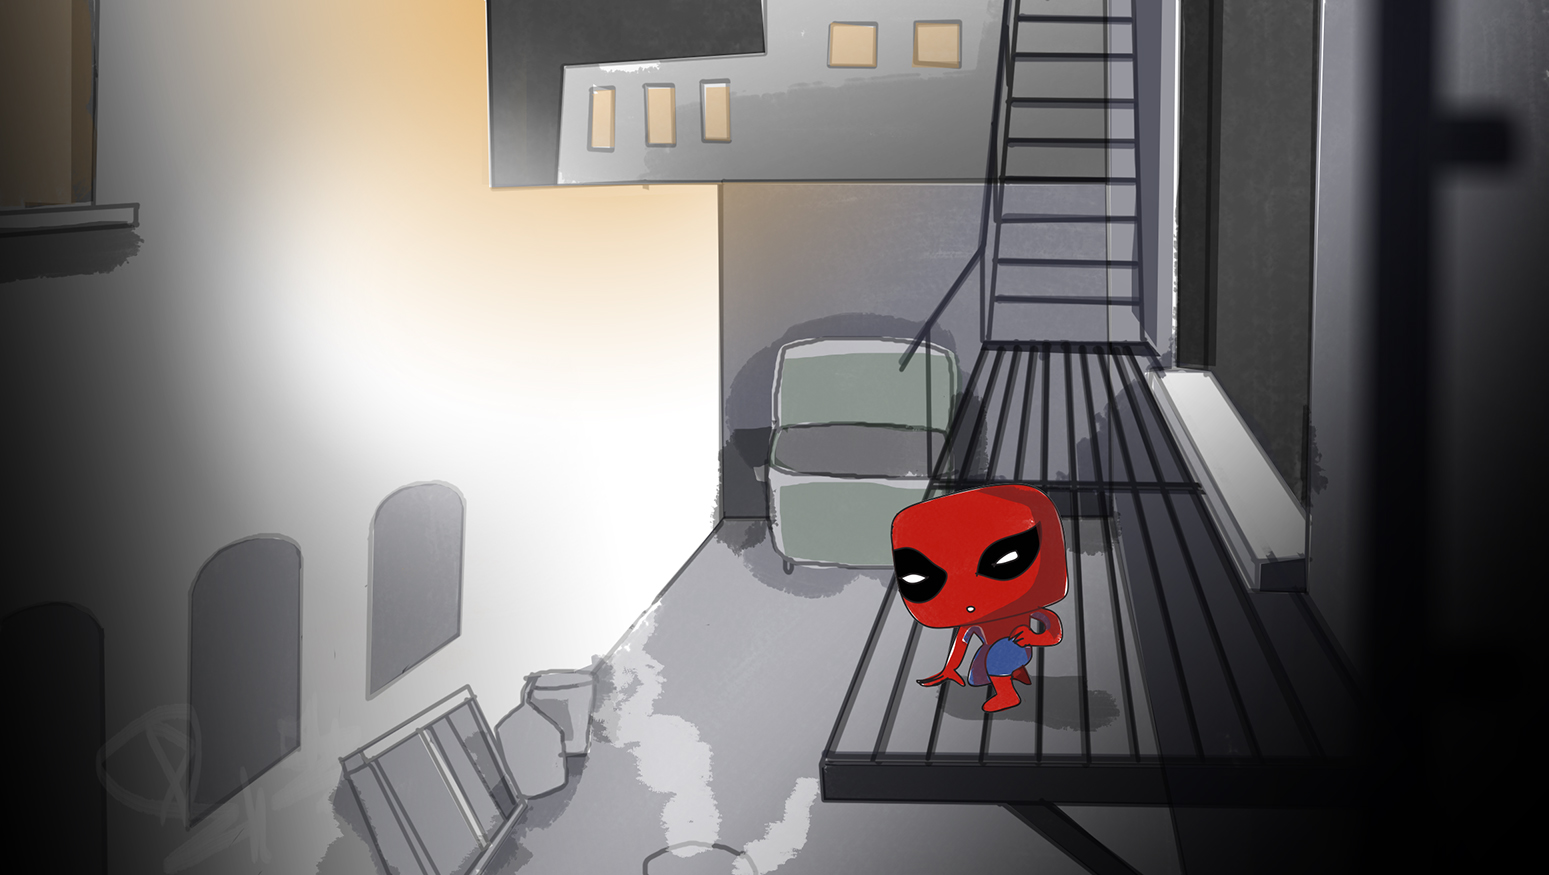 Spiderman_Vulture_02V03 copy.jpg